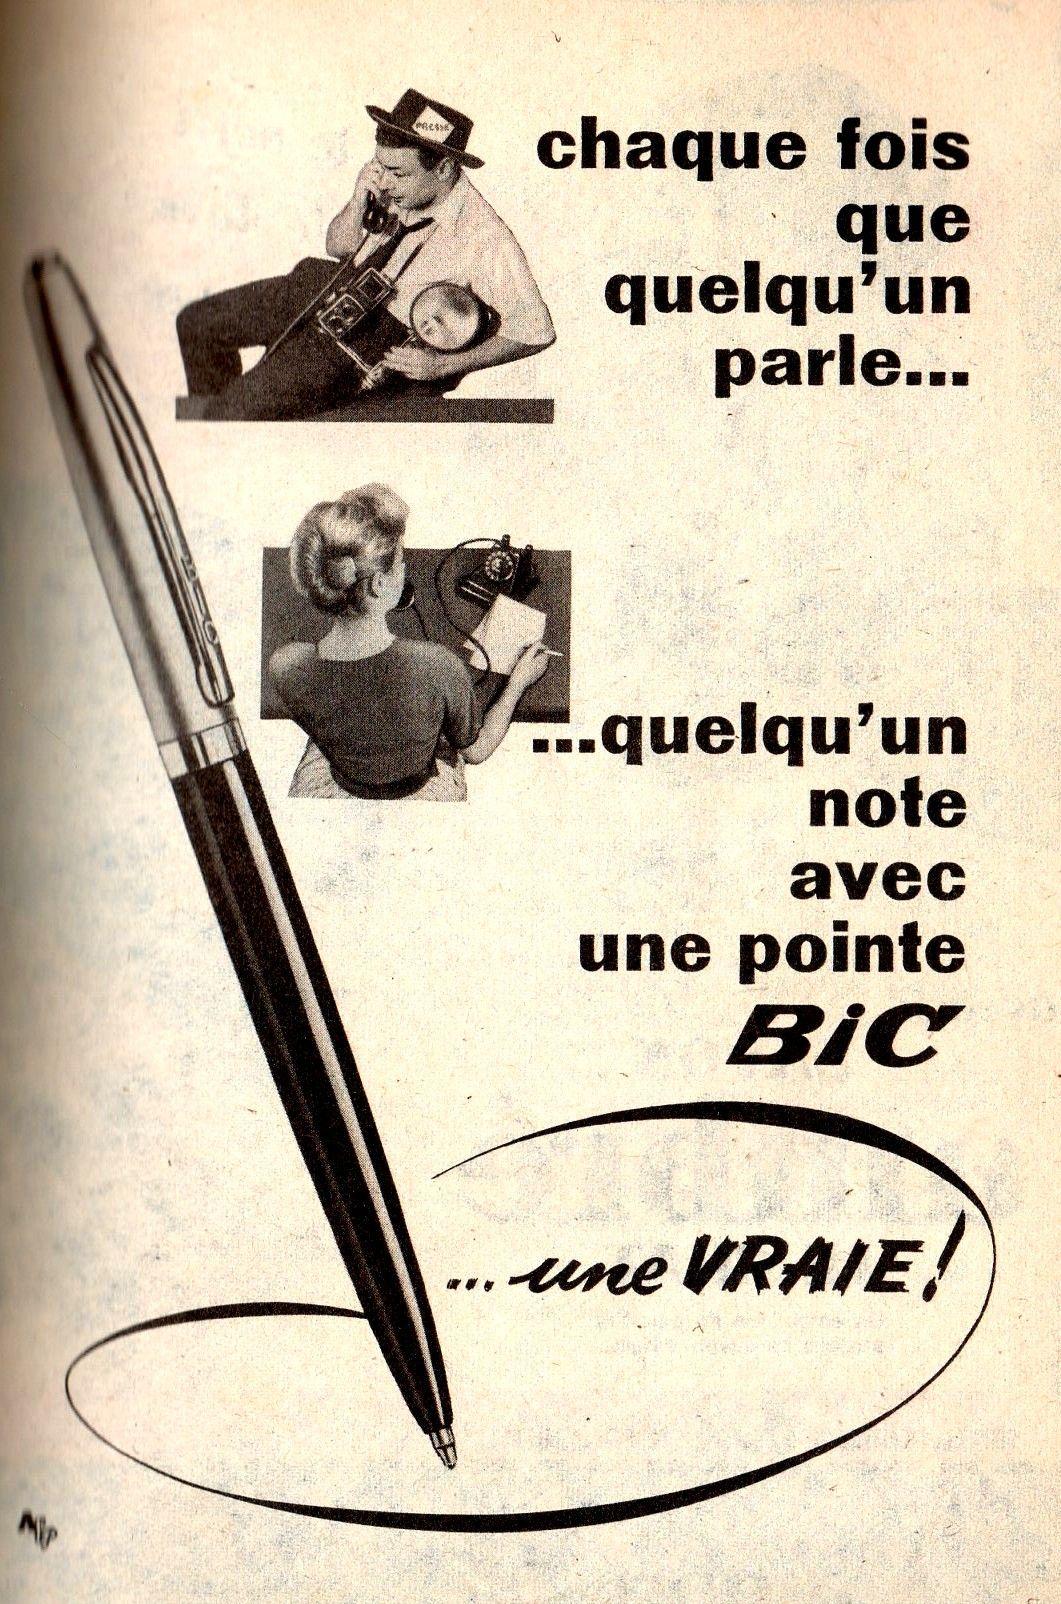 Francia, 1957.